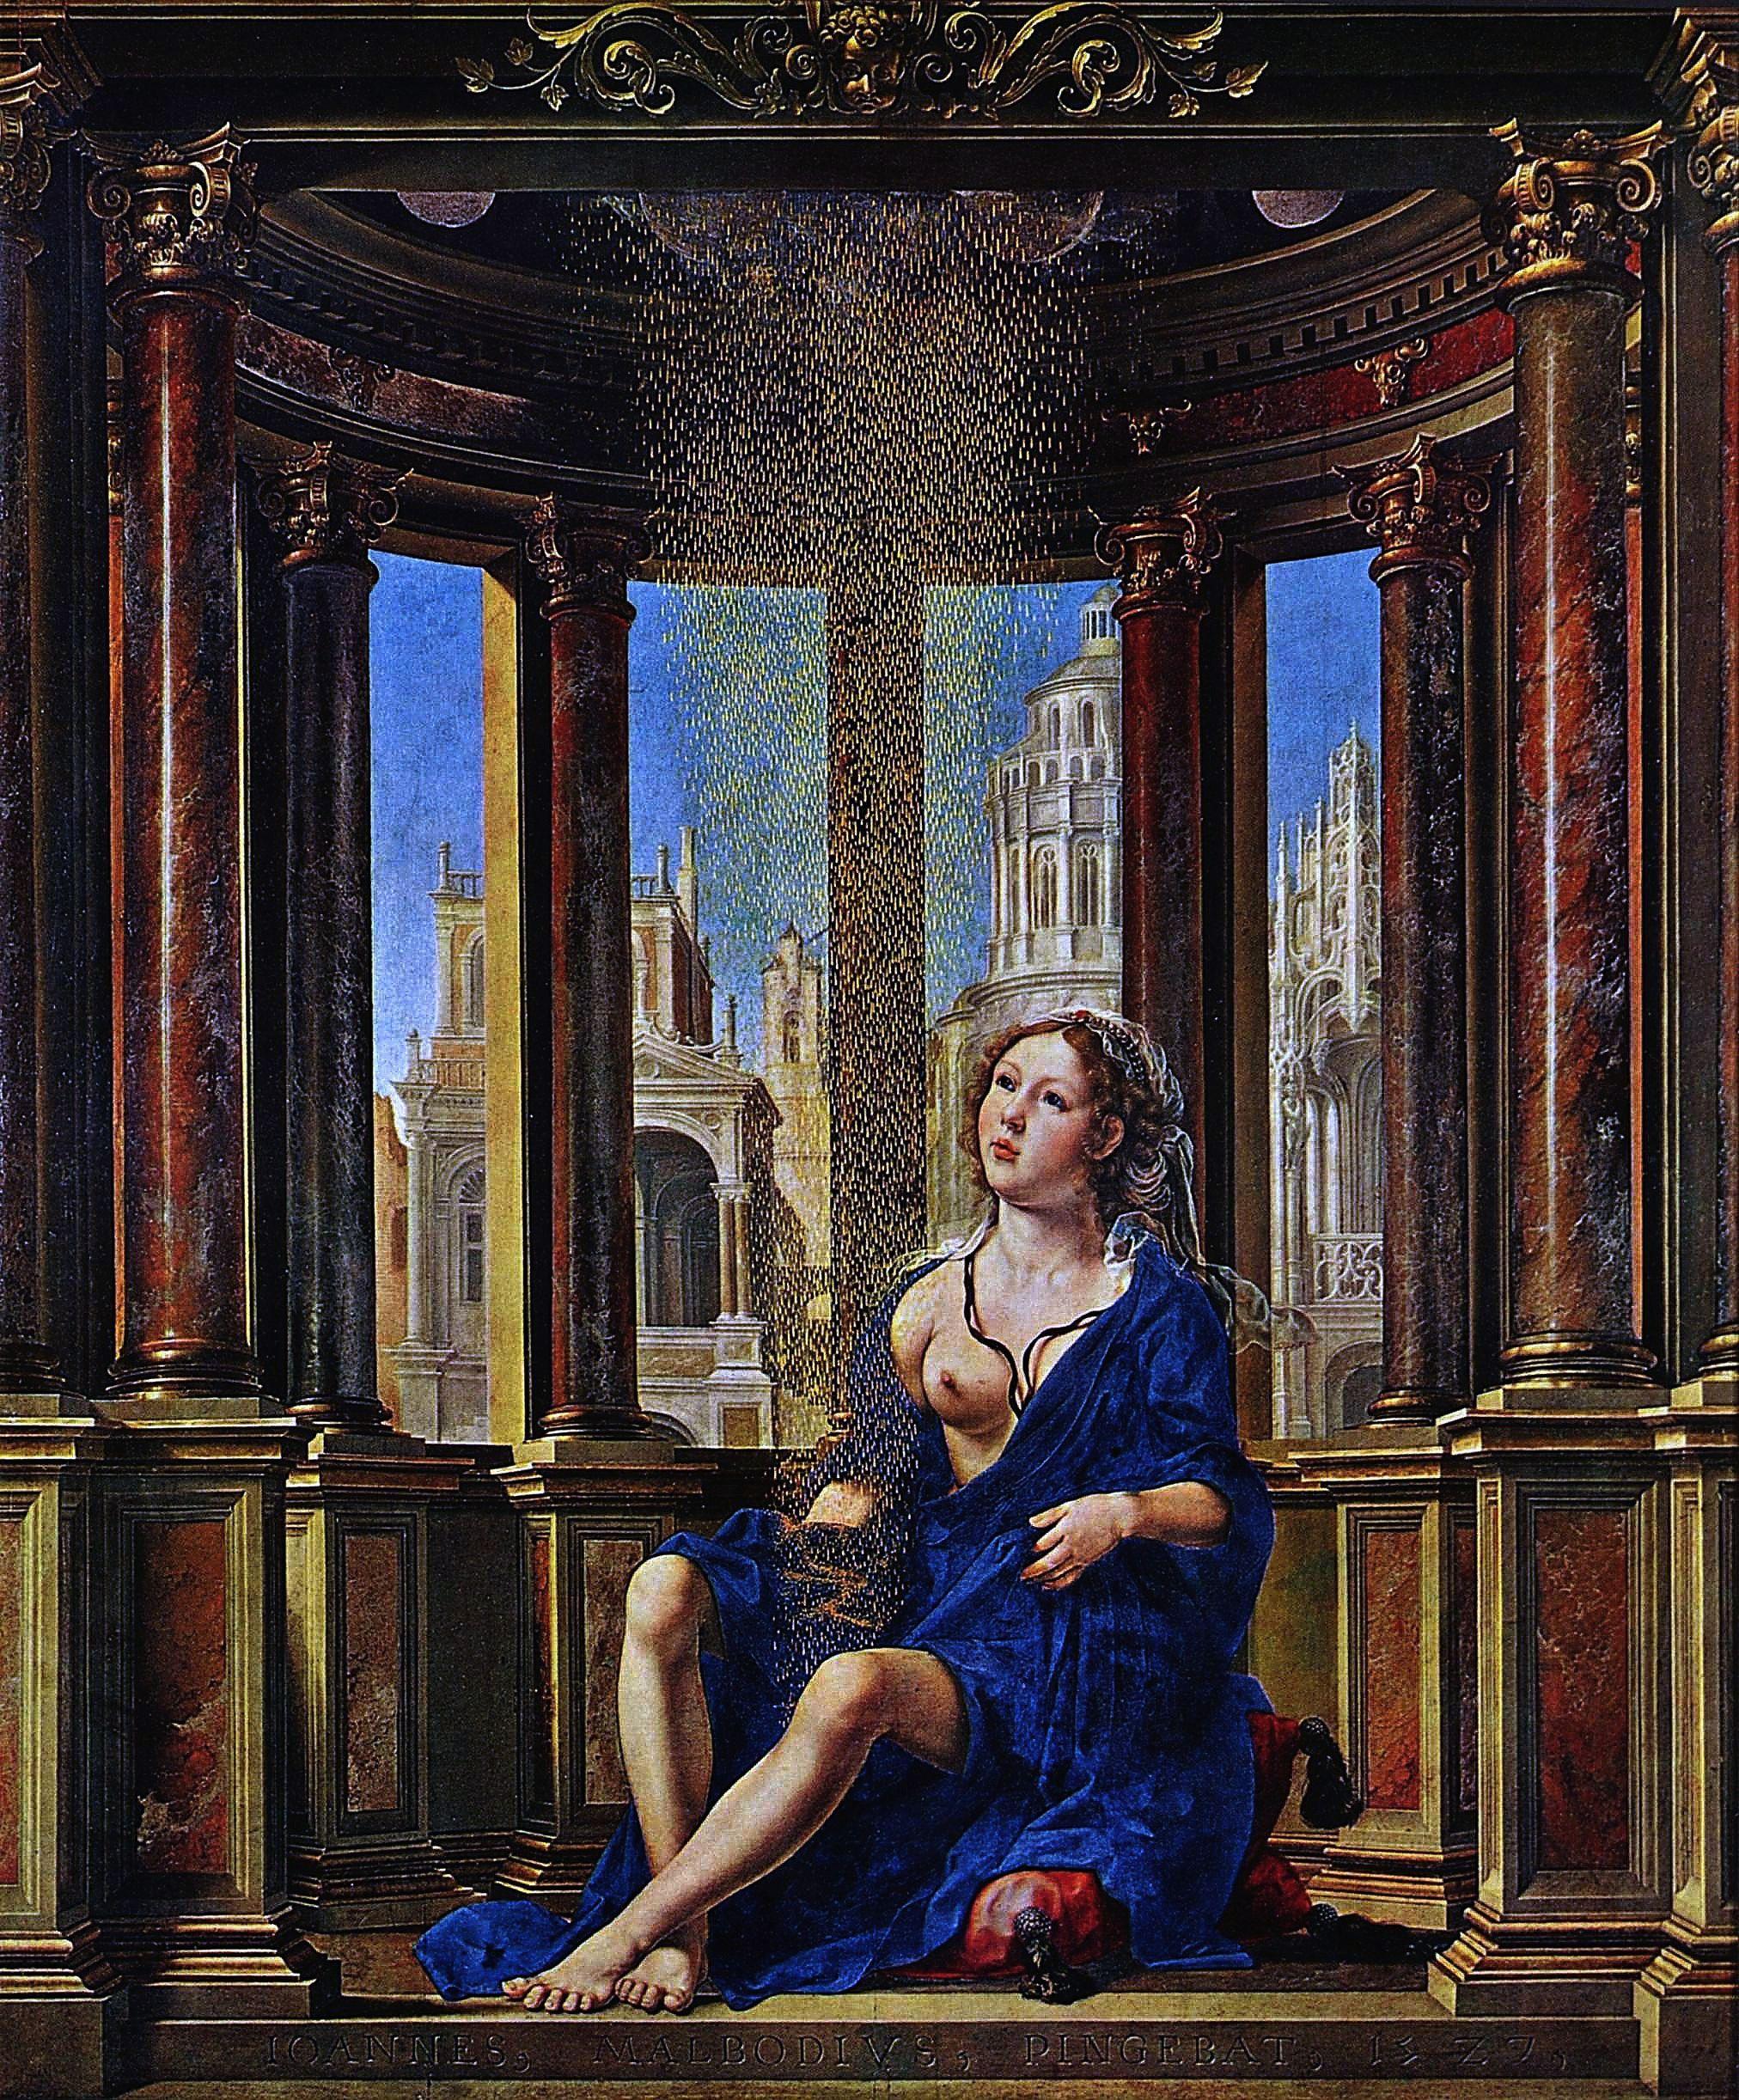 Jan Gossaert (dit Mabuse), Danaé, 1527, Huile sur toile, 177,2×161,8 cm, Alte Pinakothek, Monaco di Baviera.